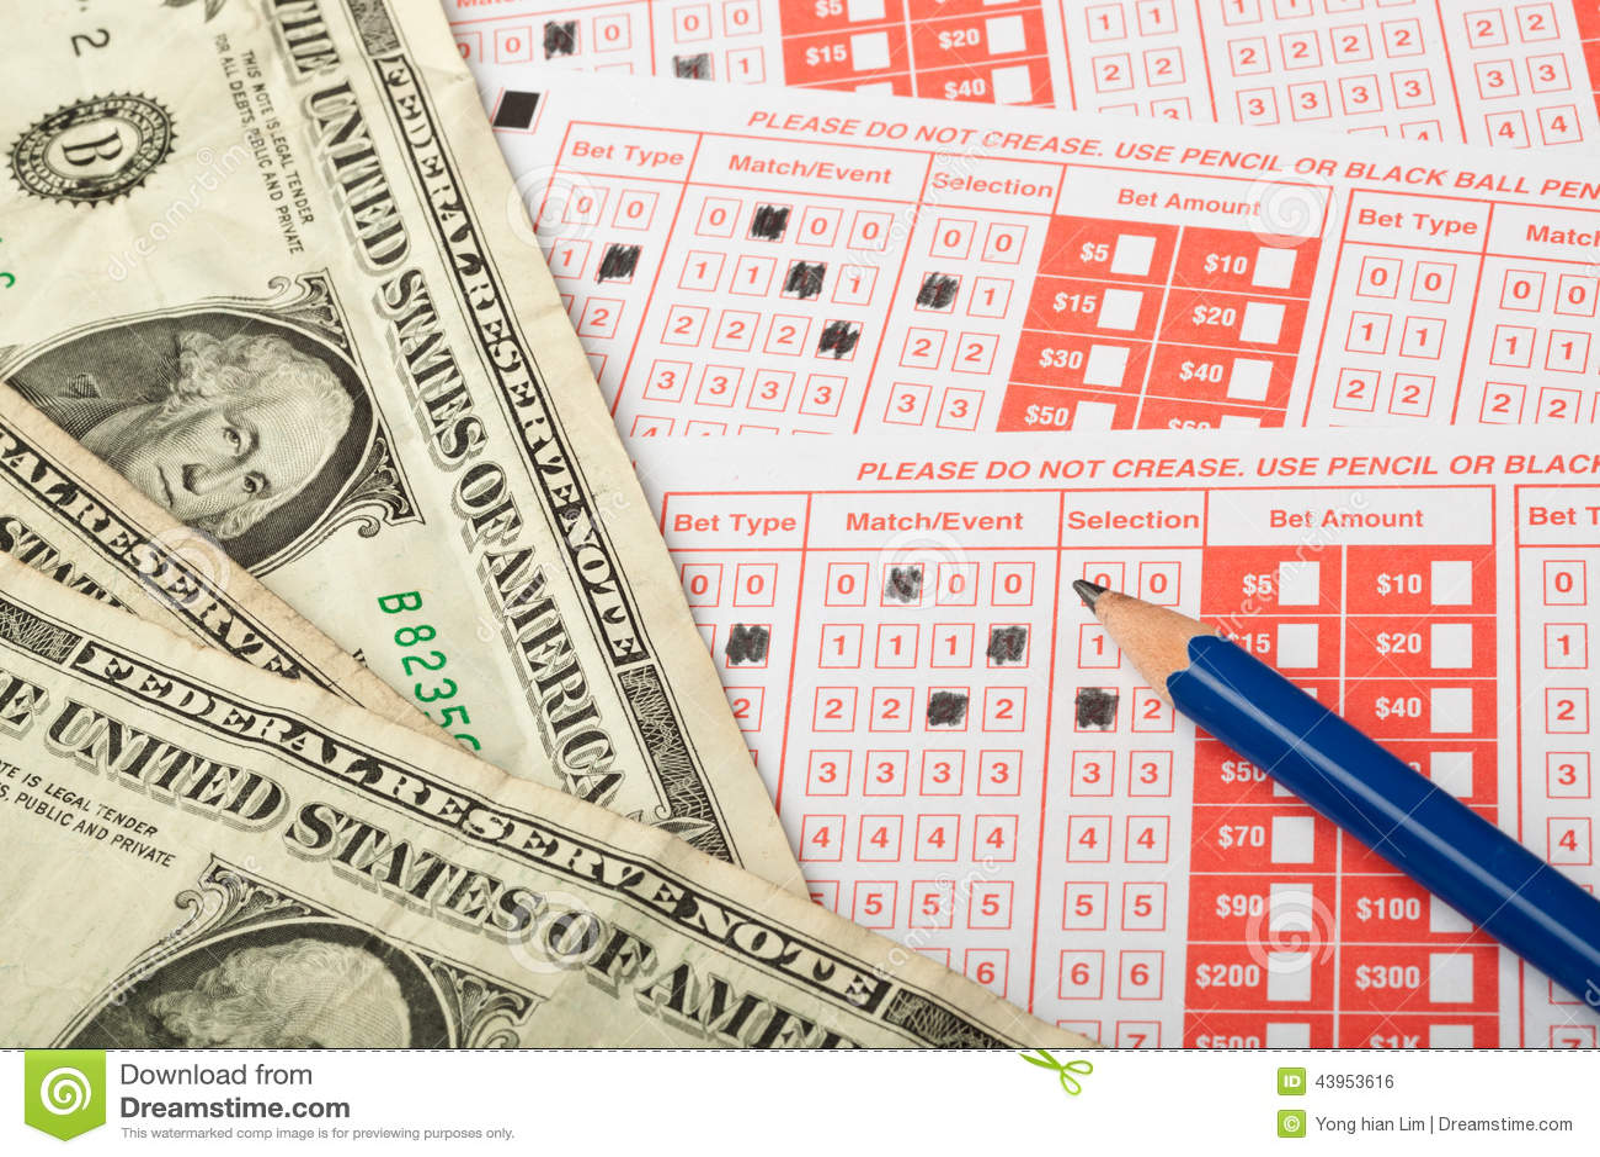 betting money online nfl standings overall